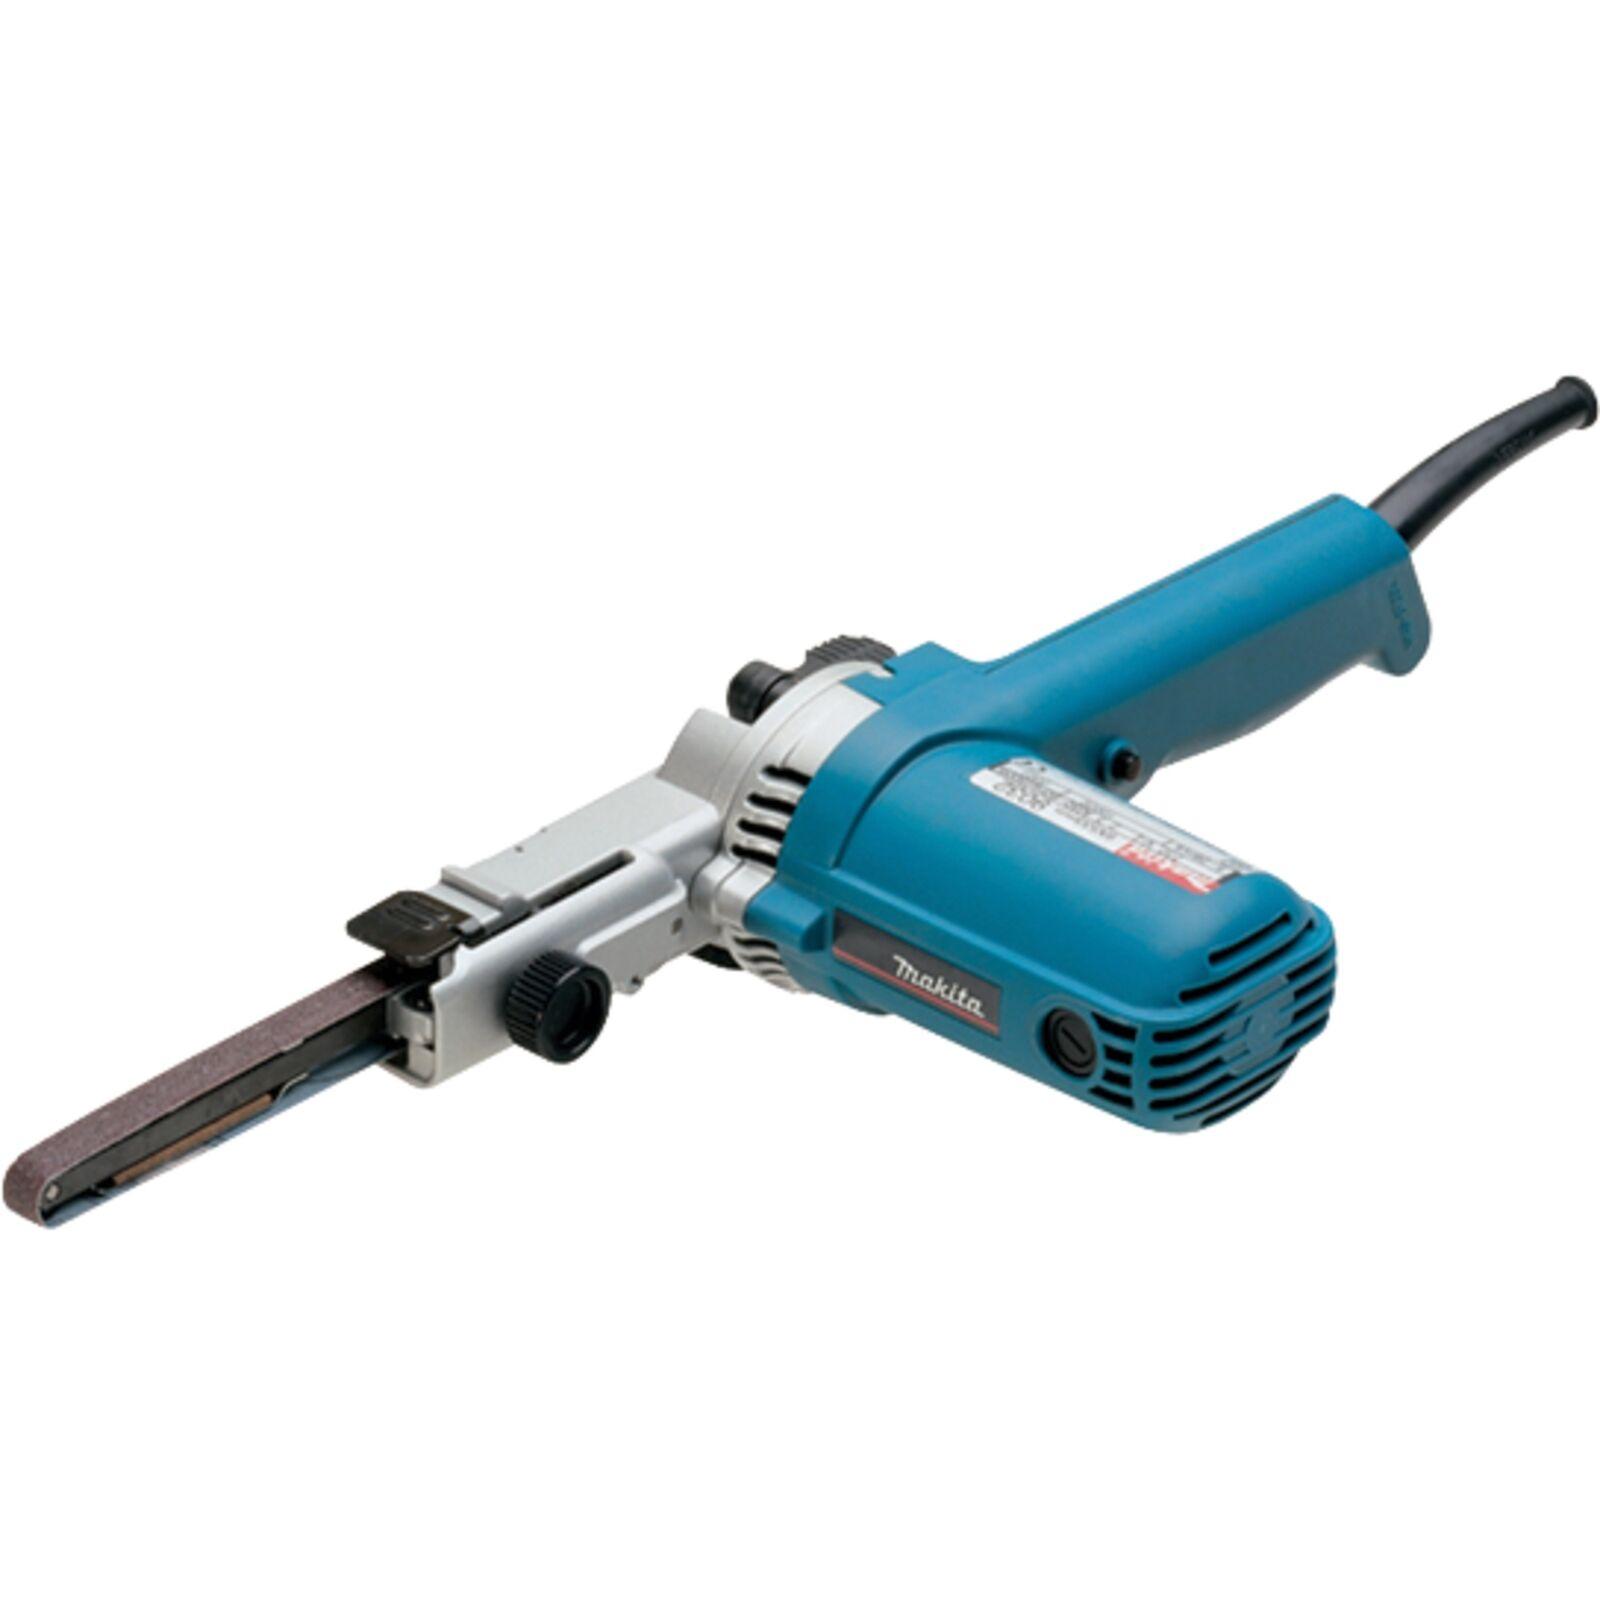 Makita Bandfeile 9032, Elektrofeile, blau